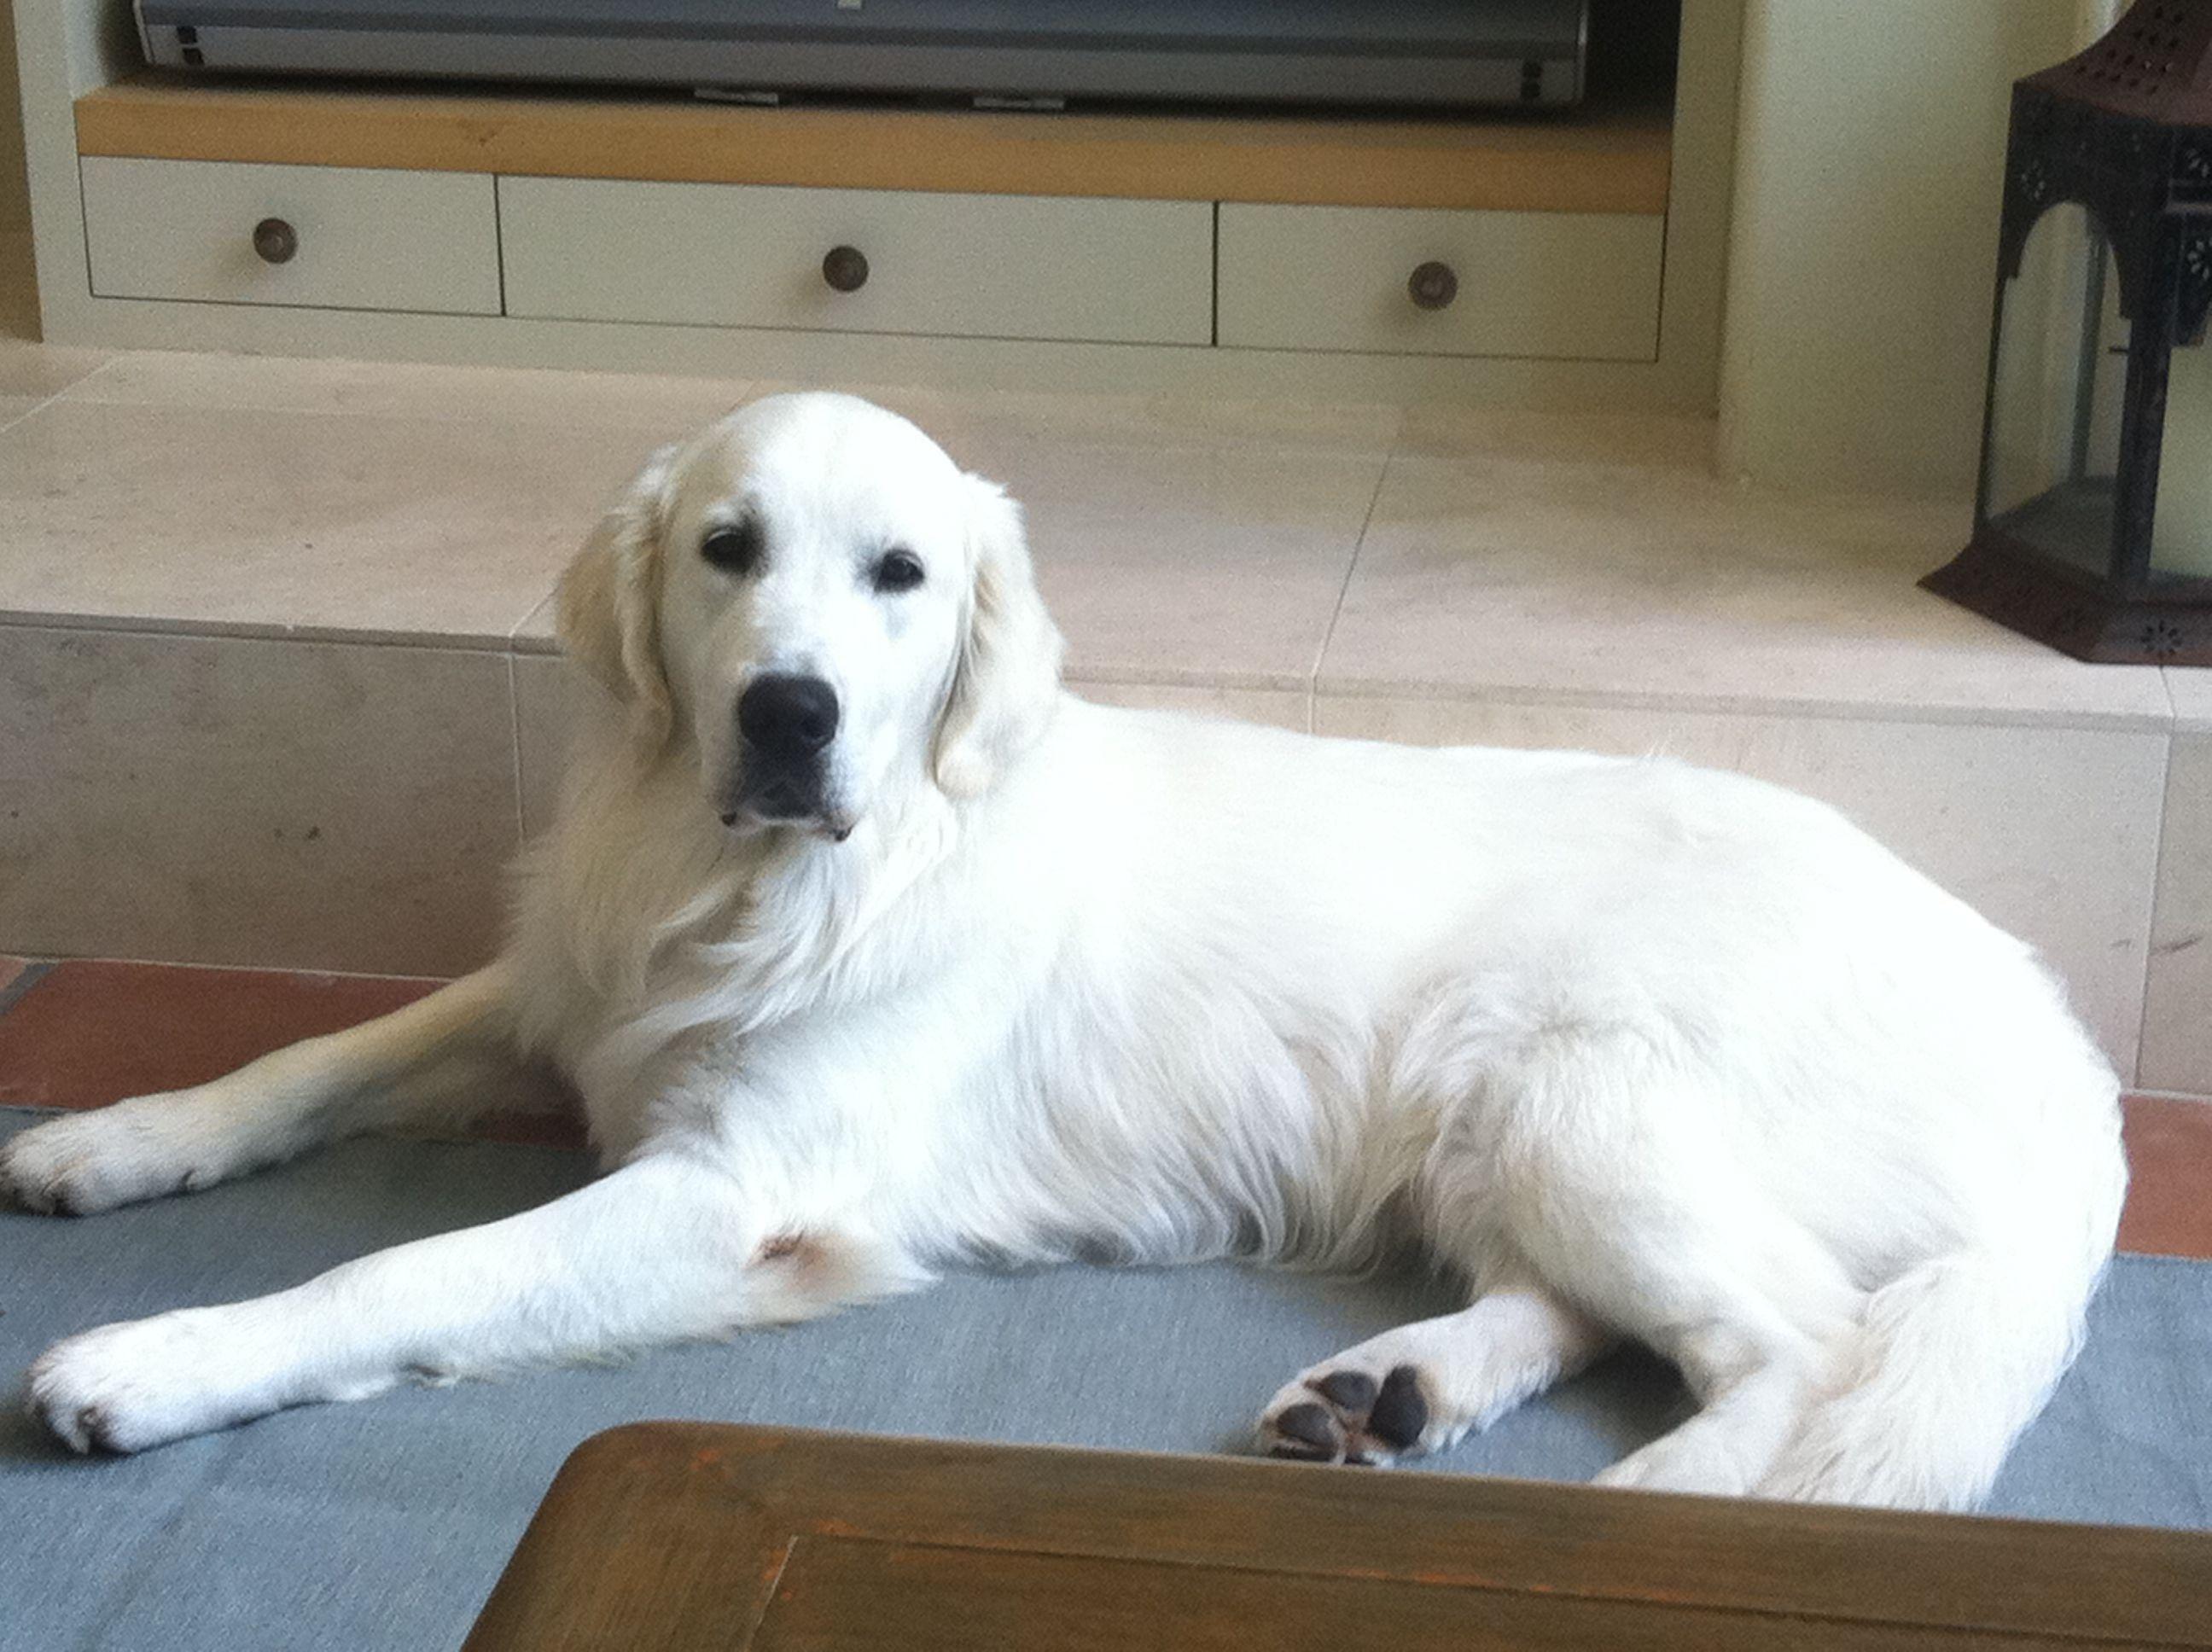 Beautiful Doggies Everybody Needs A White Golden Retriever In